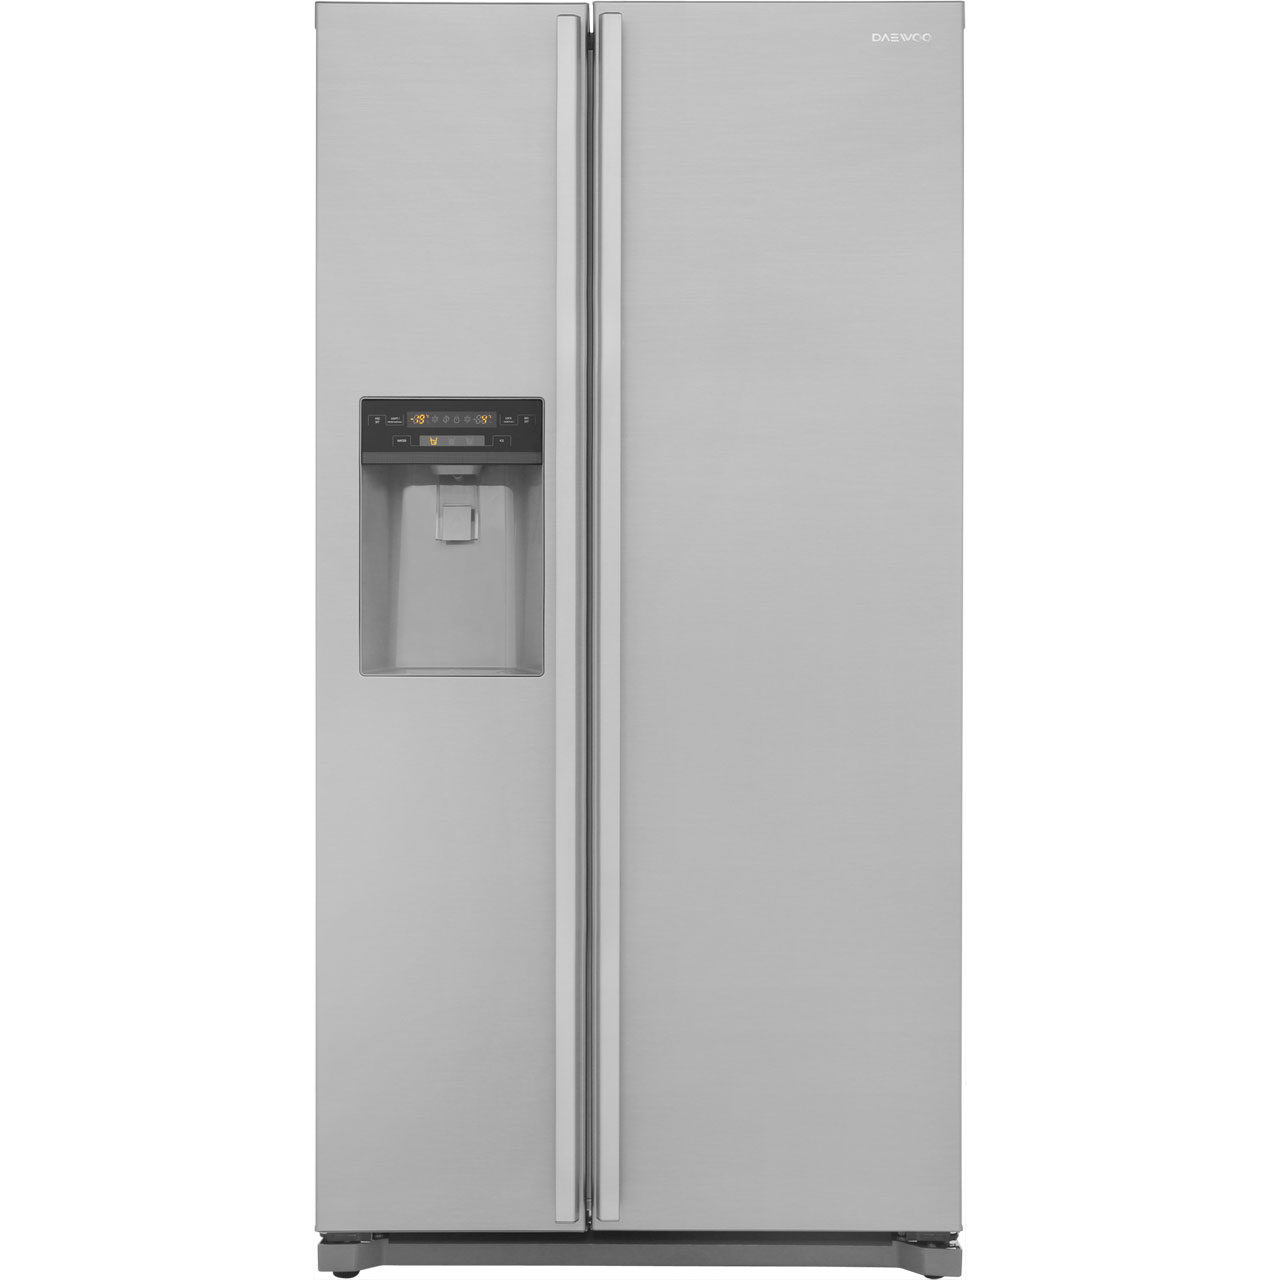 Daewoo FRAX22D3S Free Standing American Fridge Freezer in Silver